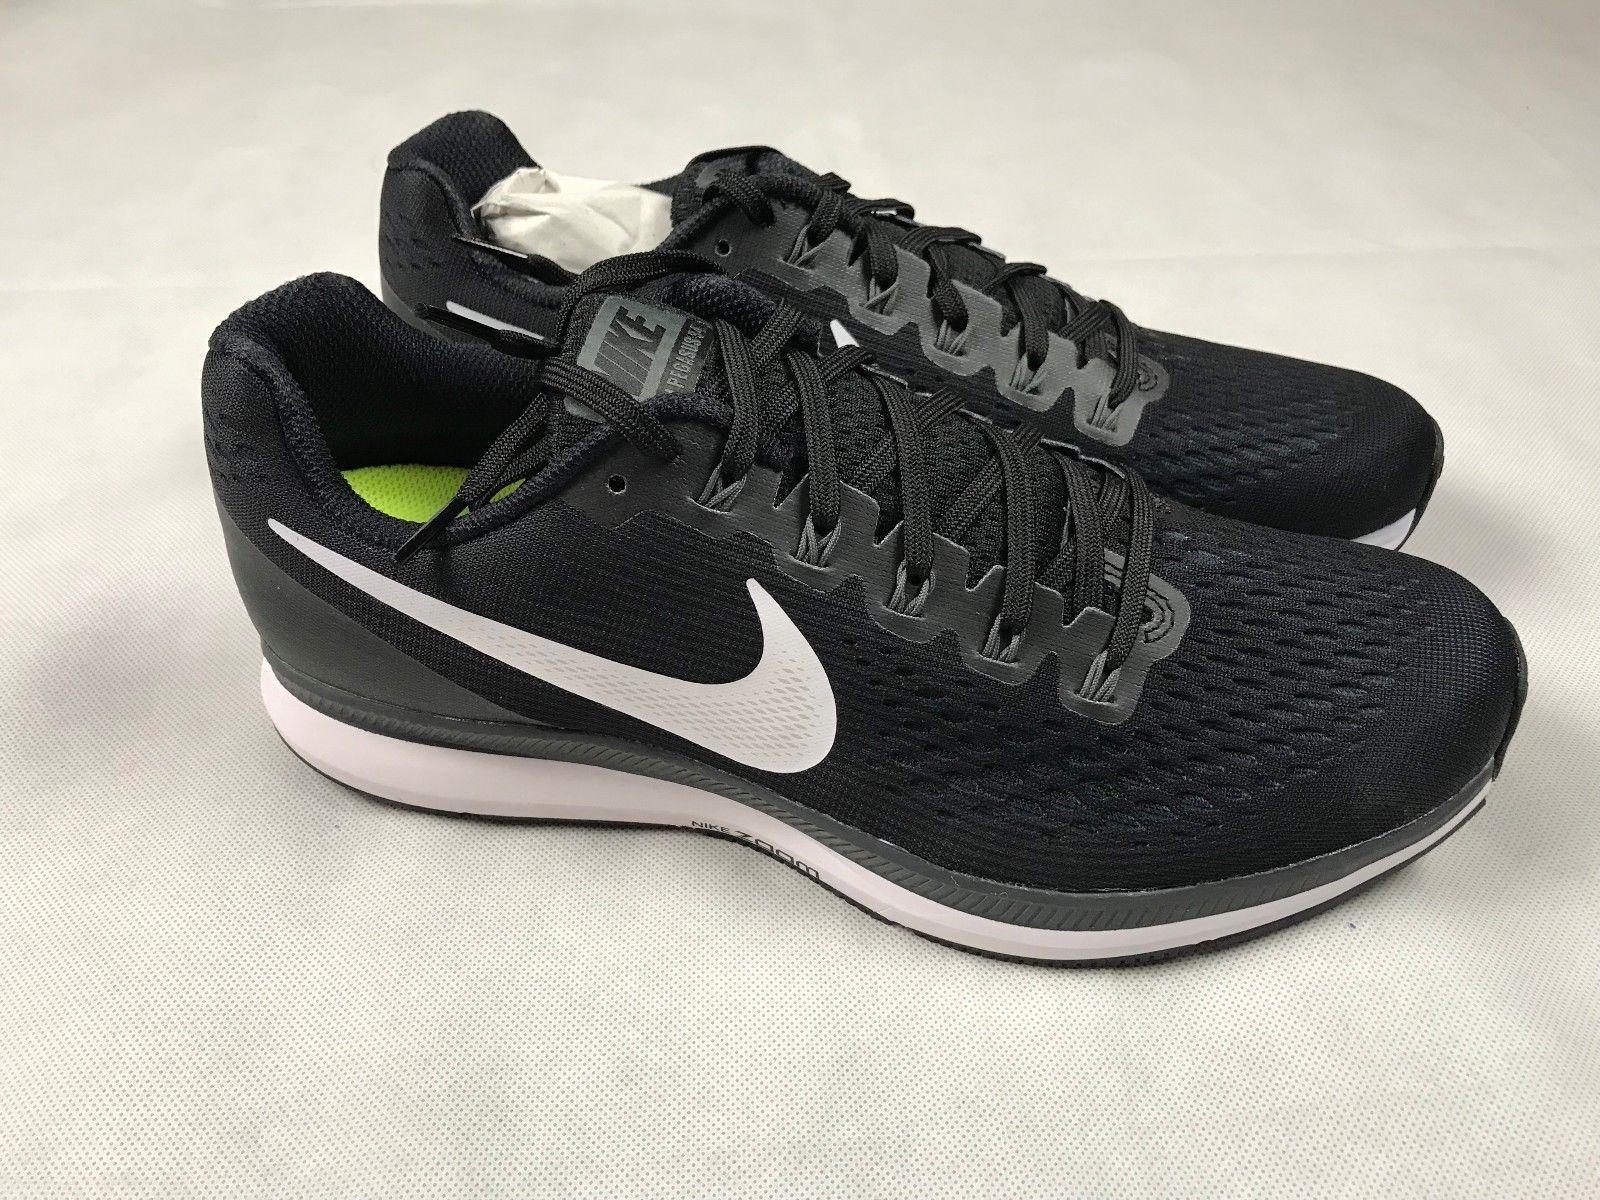 Nike Women's Air Zoom Pegasus 34 Black White Grey 880560-001 Sz 7.5 New